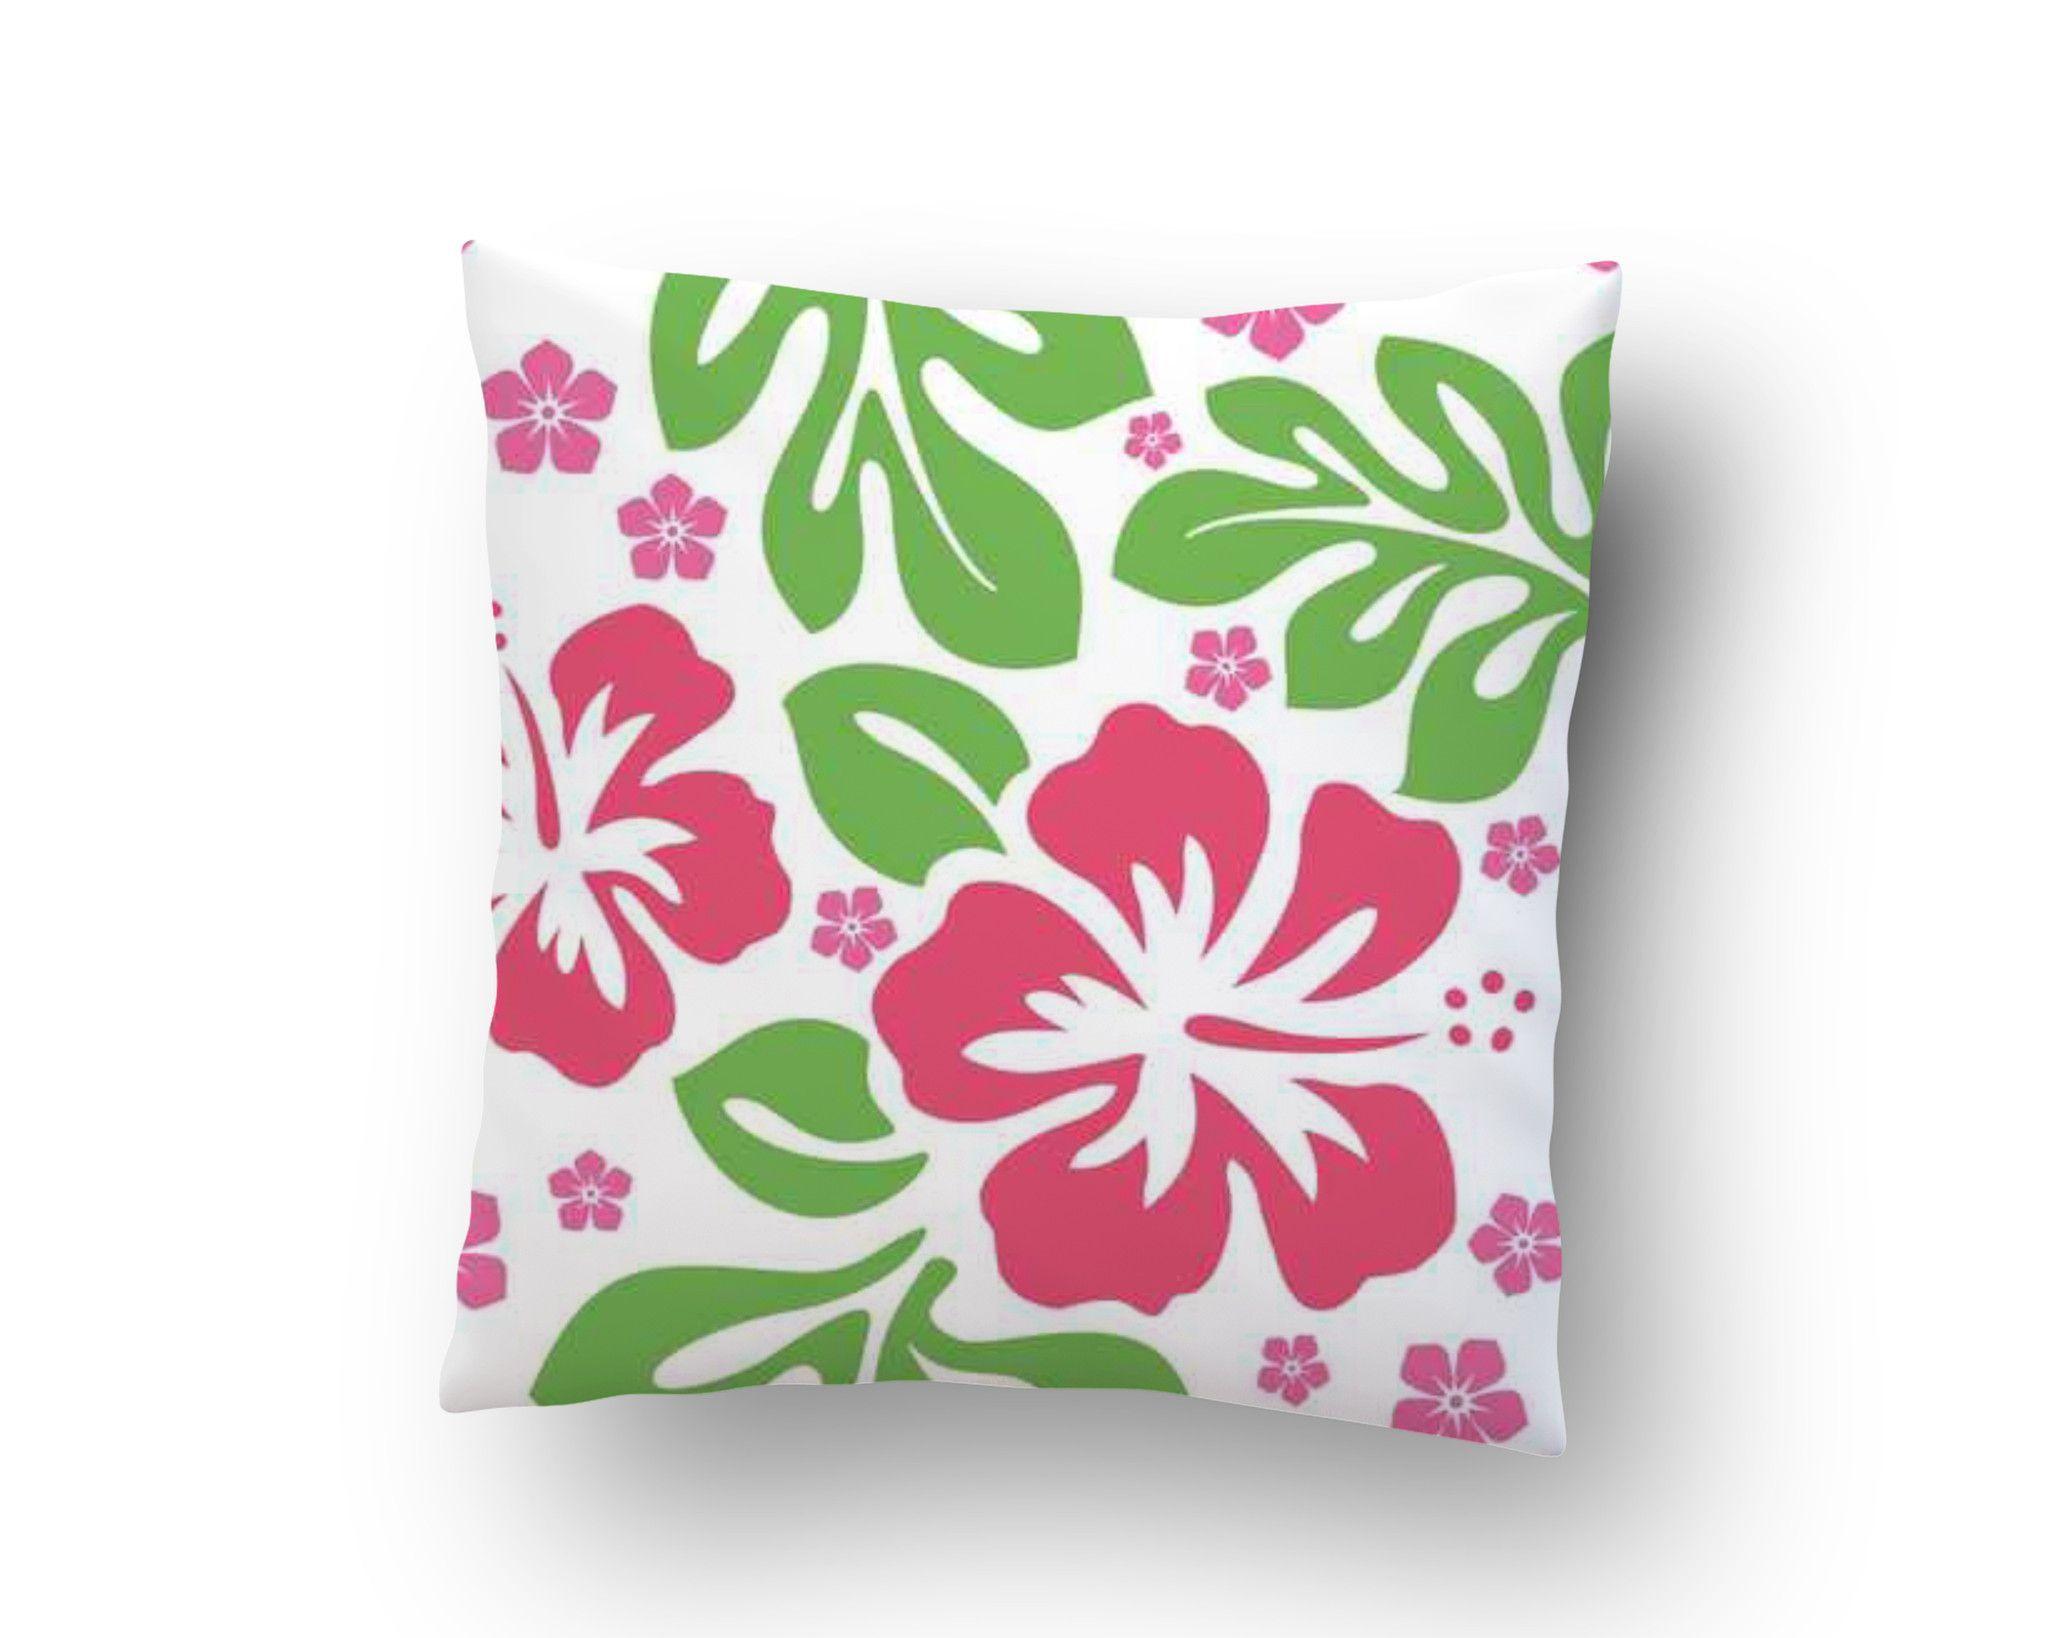 Green and pink hibiscus hawaiian throw pillow case from surfer green and pink hibiscus hawaiian throw pillow case from surfer bedding izmirmasajfo Images